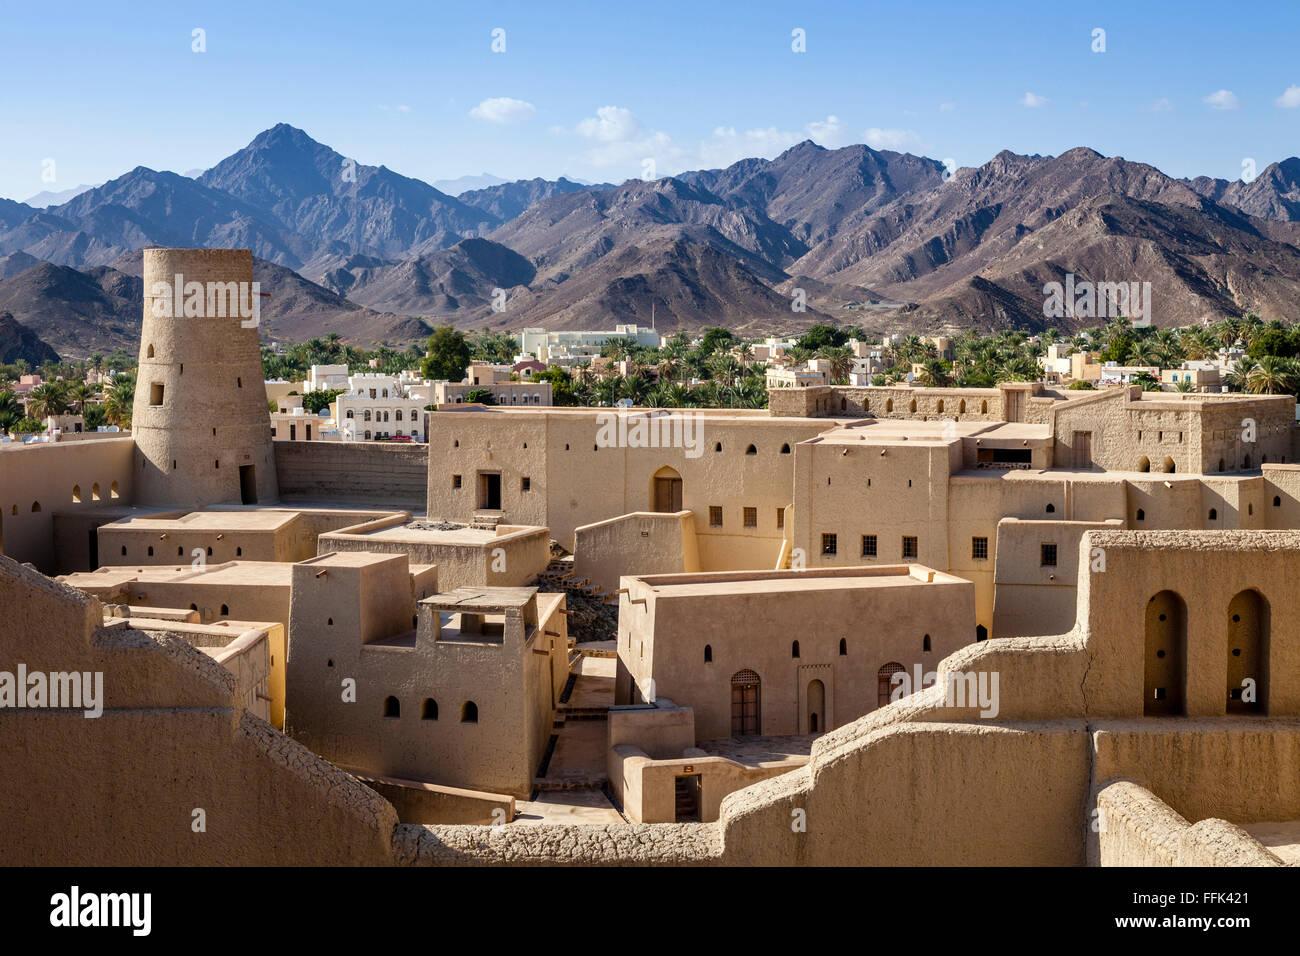 Bahla Fort, Ad Dakhiliyah Region, Oman - Stock Image